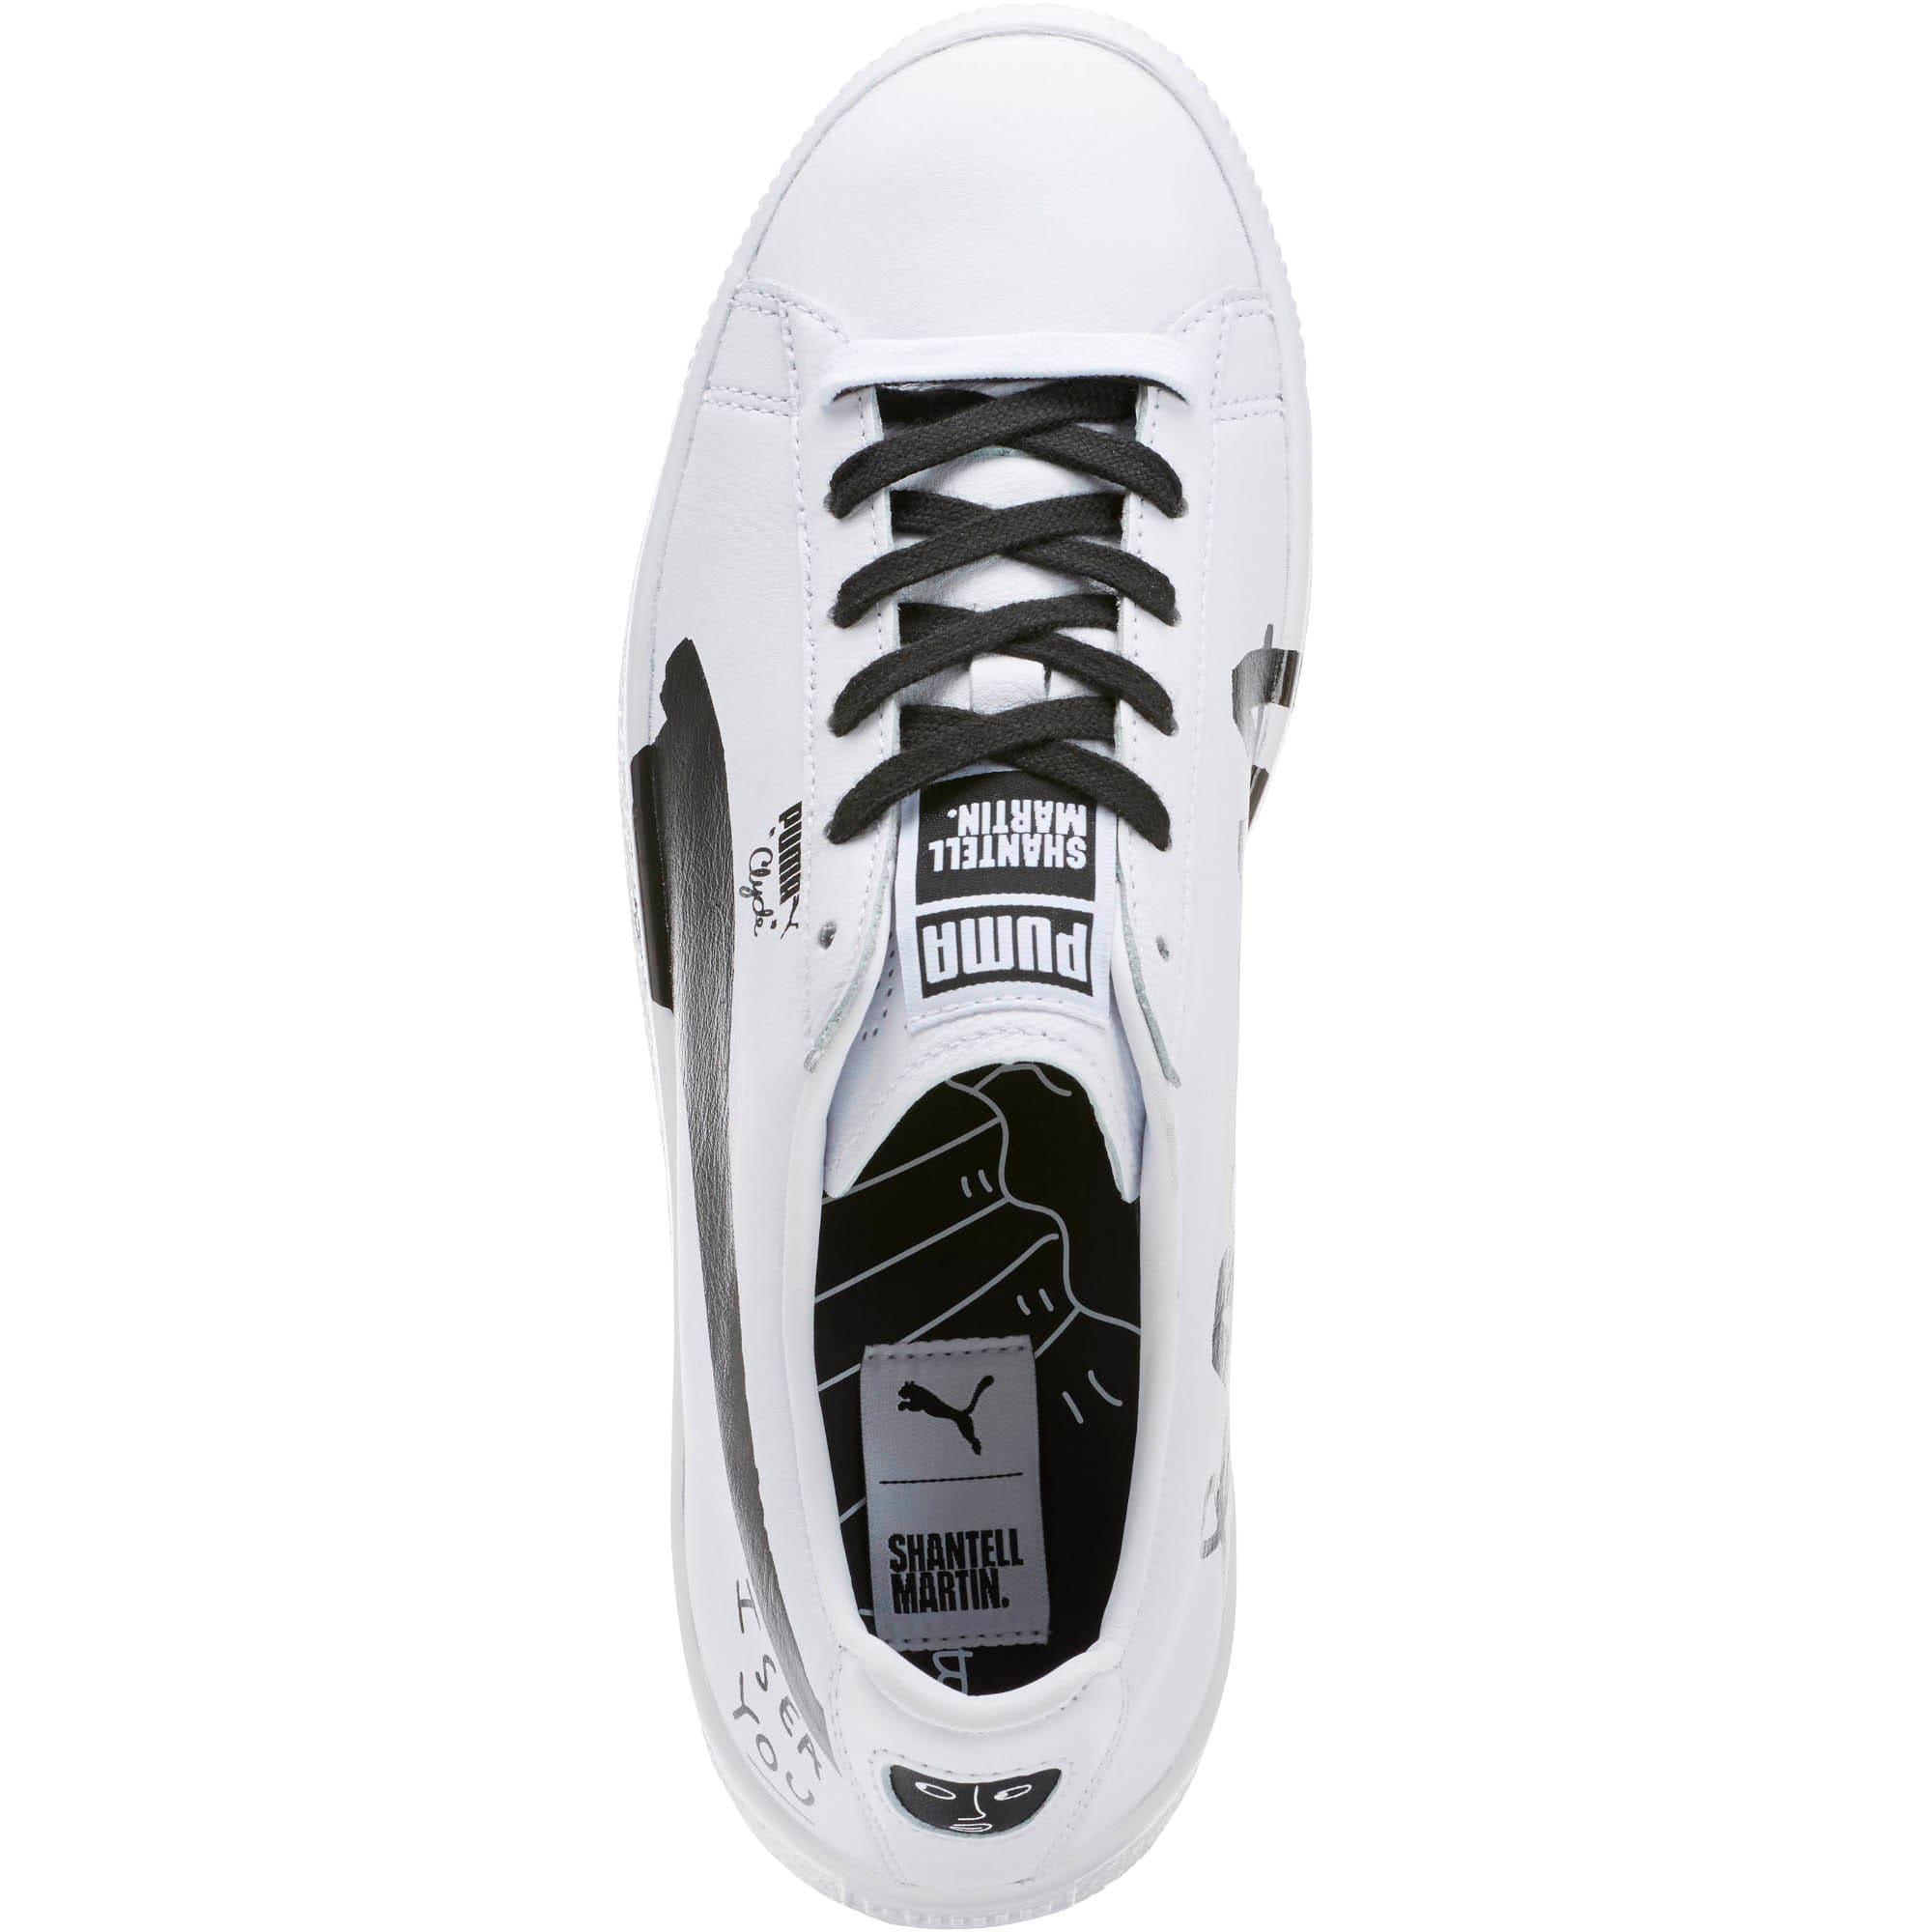 Thumbnail 5 of PUMA x SHANTELL MARTIN Clyde Sneakers, Puma White-Puma Black, medium